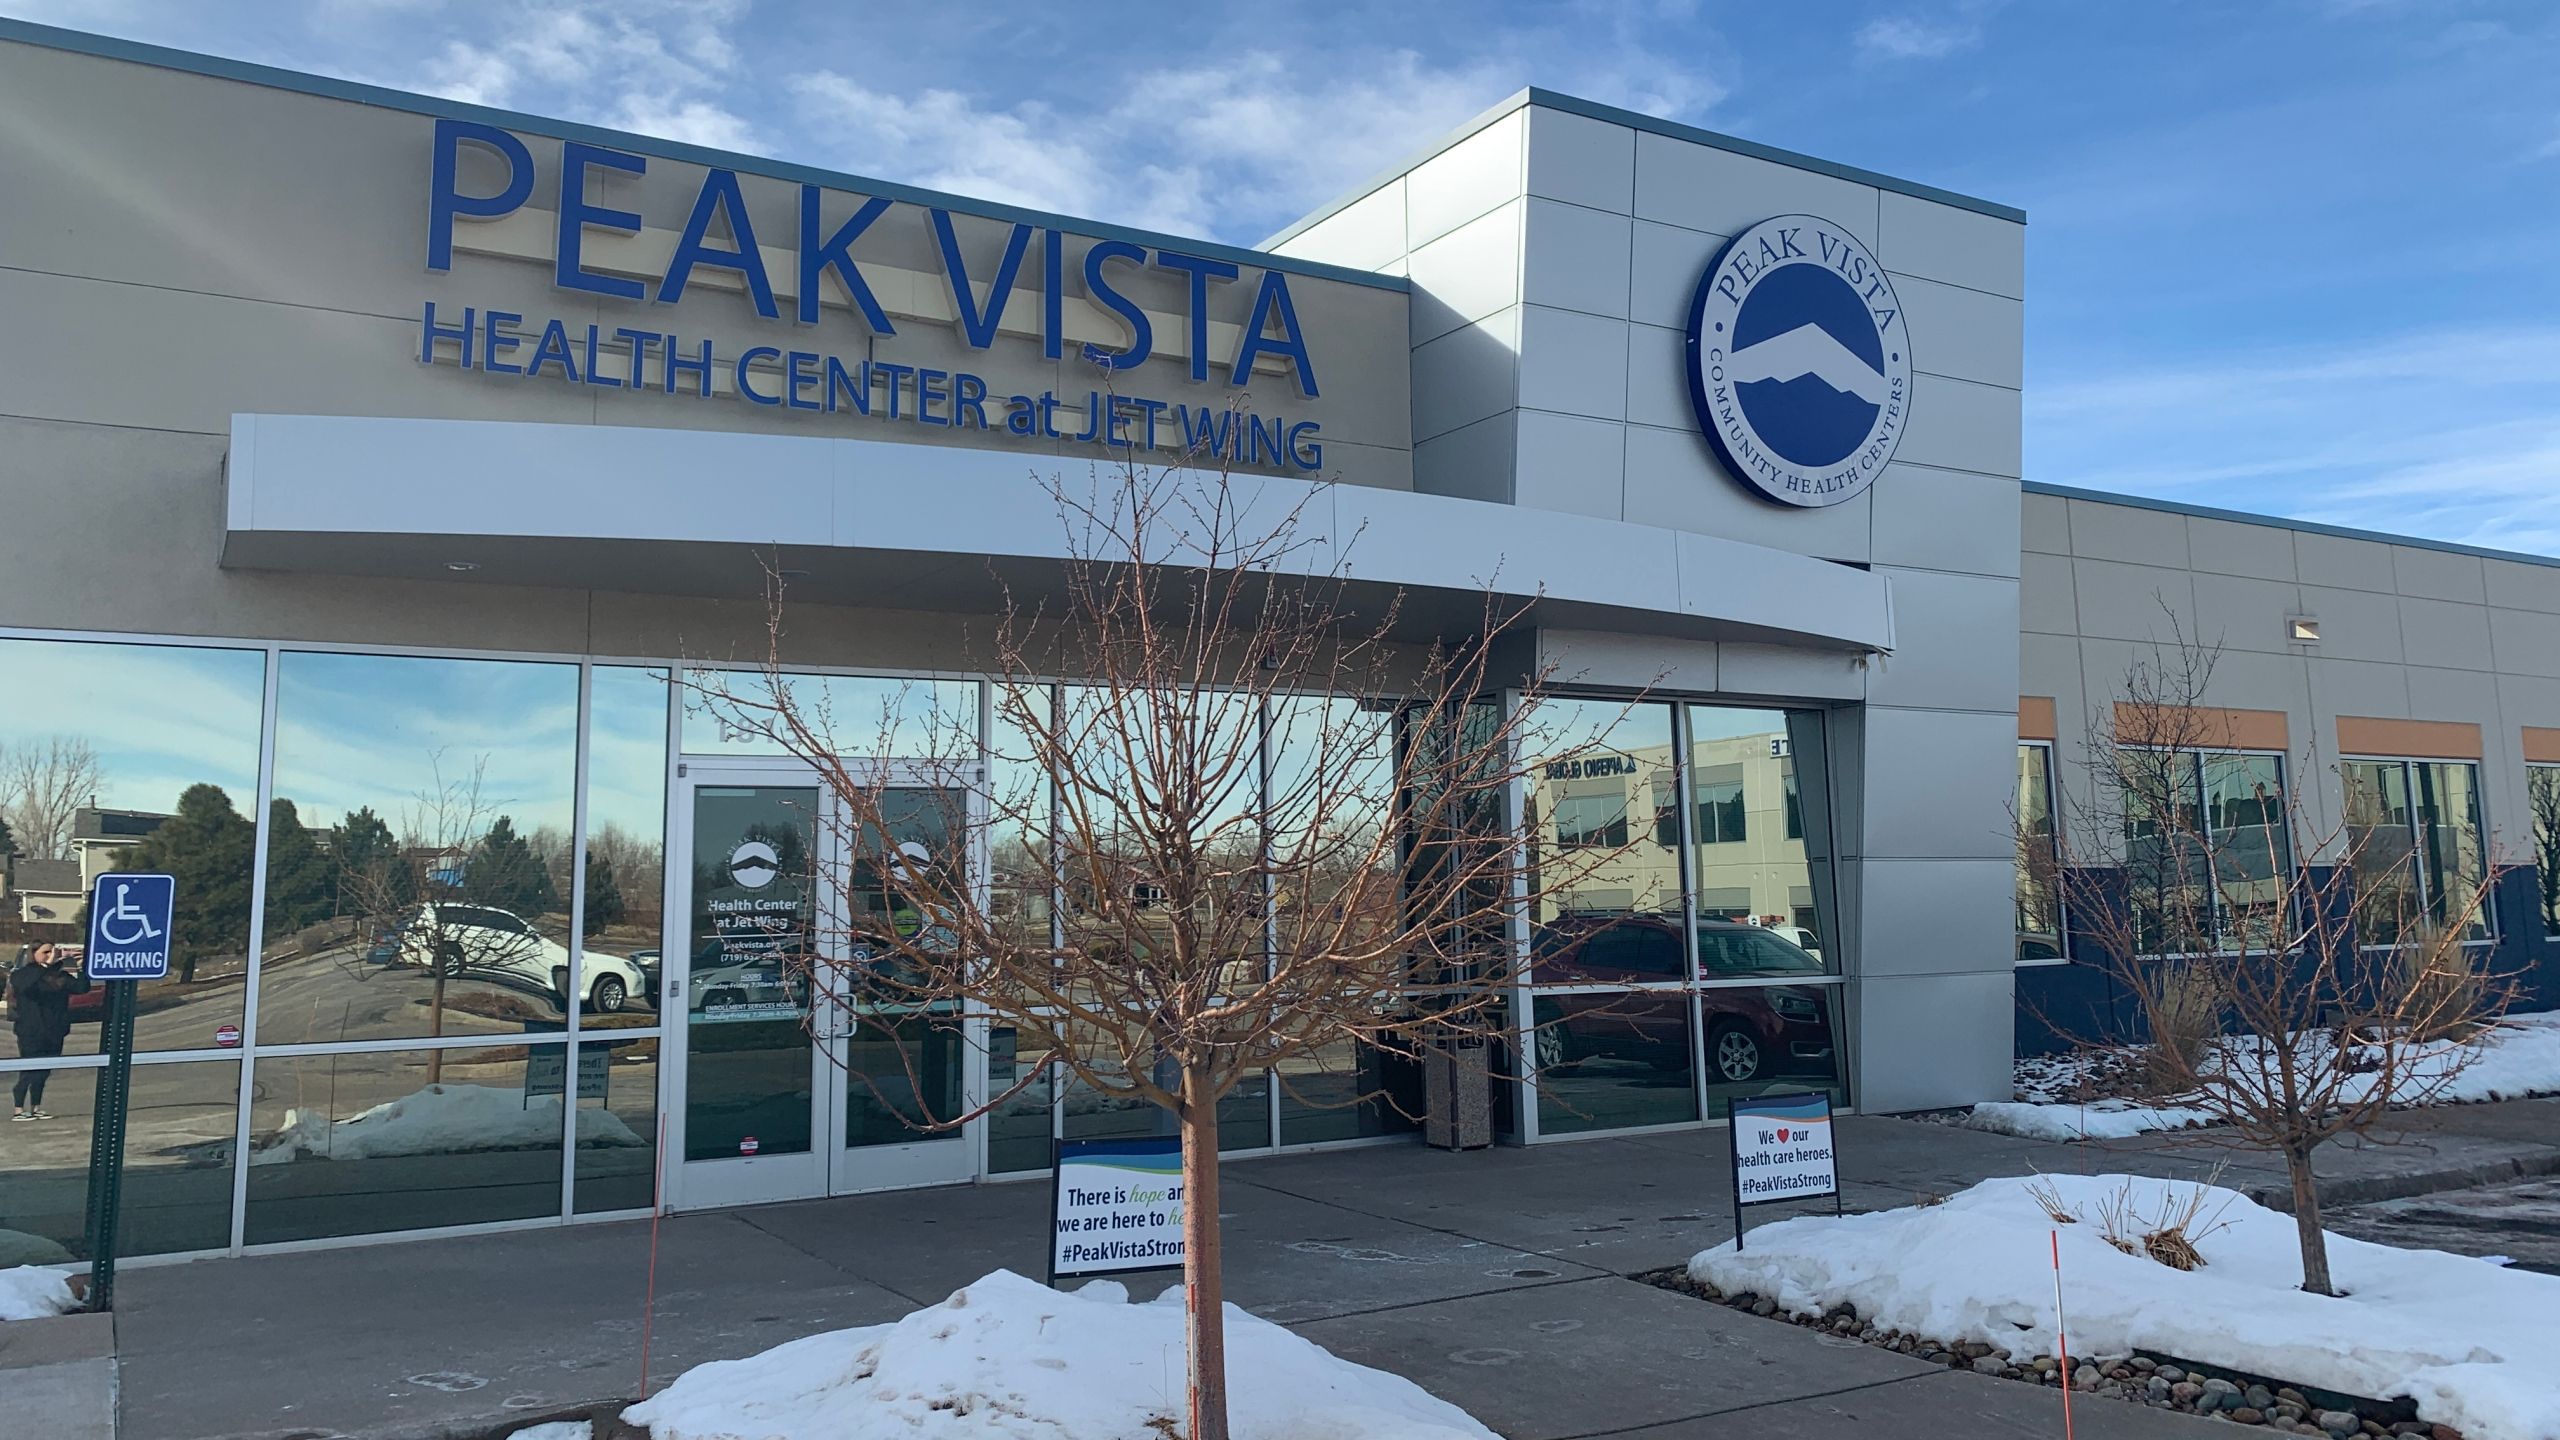 Peak Vista Community Health Center began distributing vaccines to people over age 70 on Wednesday. / Sarah Hempelmann - FOX21 News